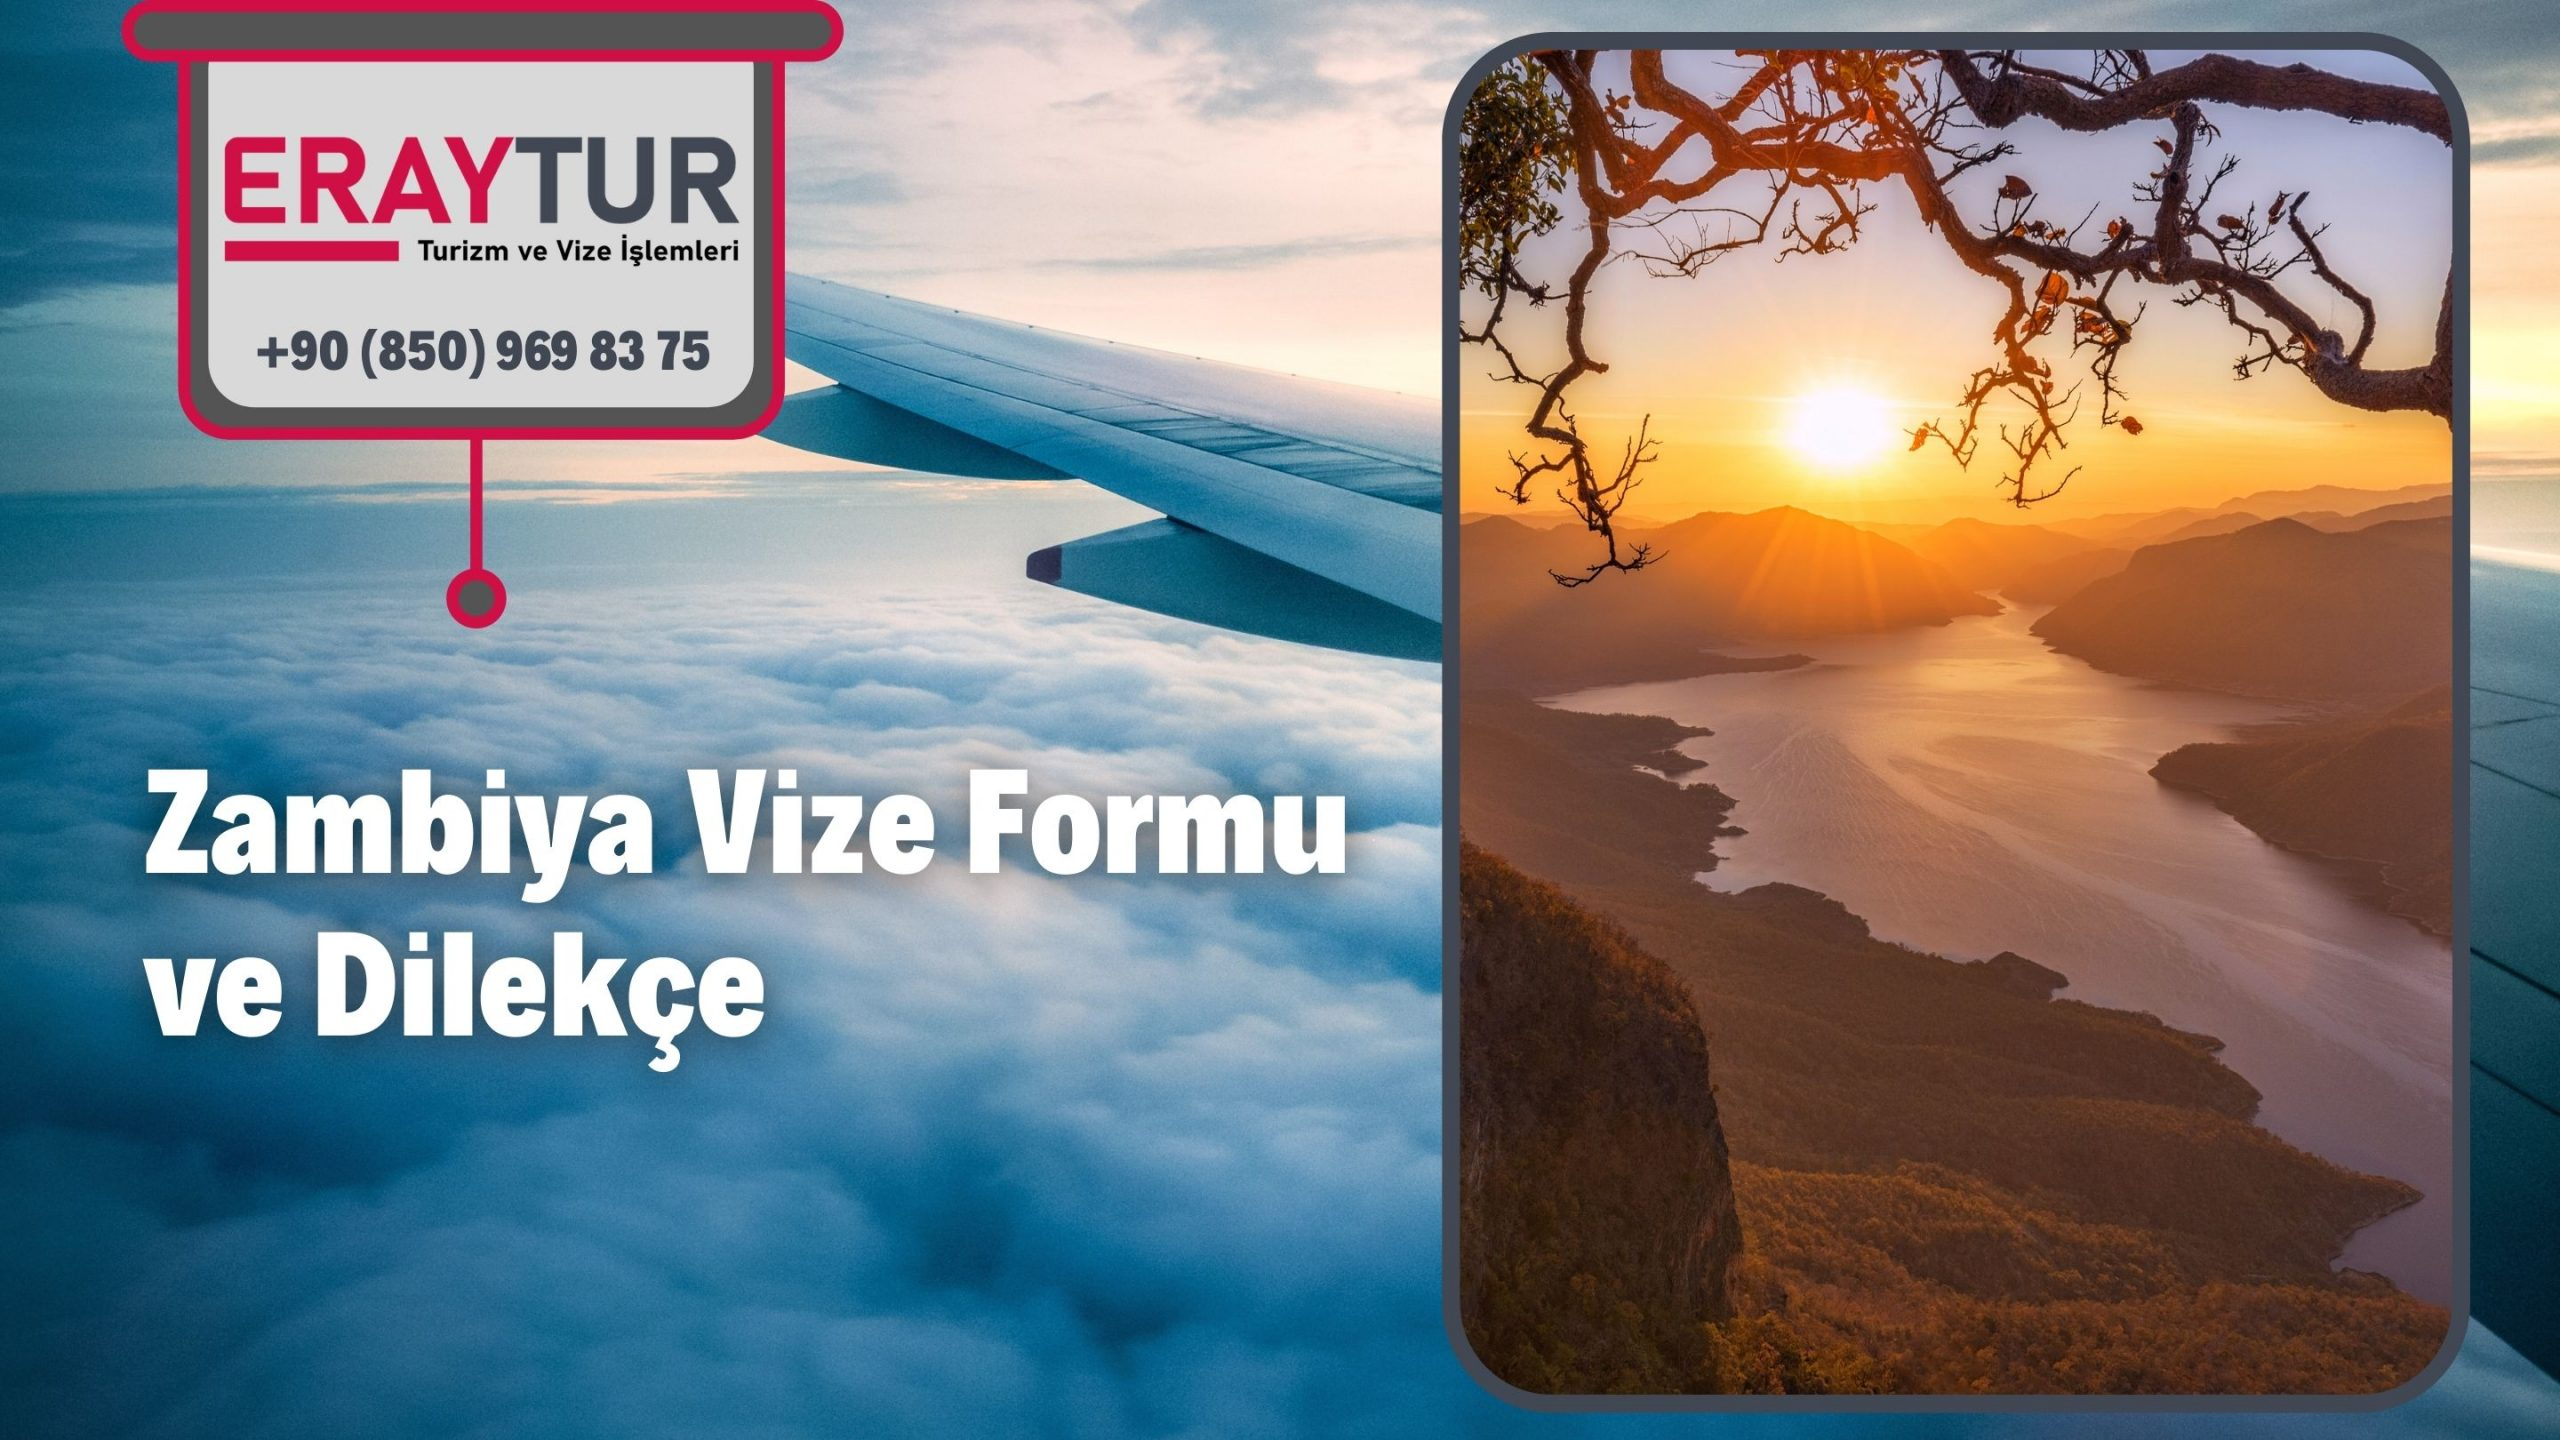 Zambiya Vize Formu ve Dilekçe